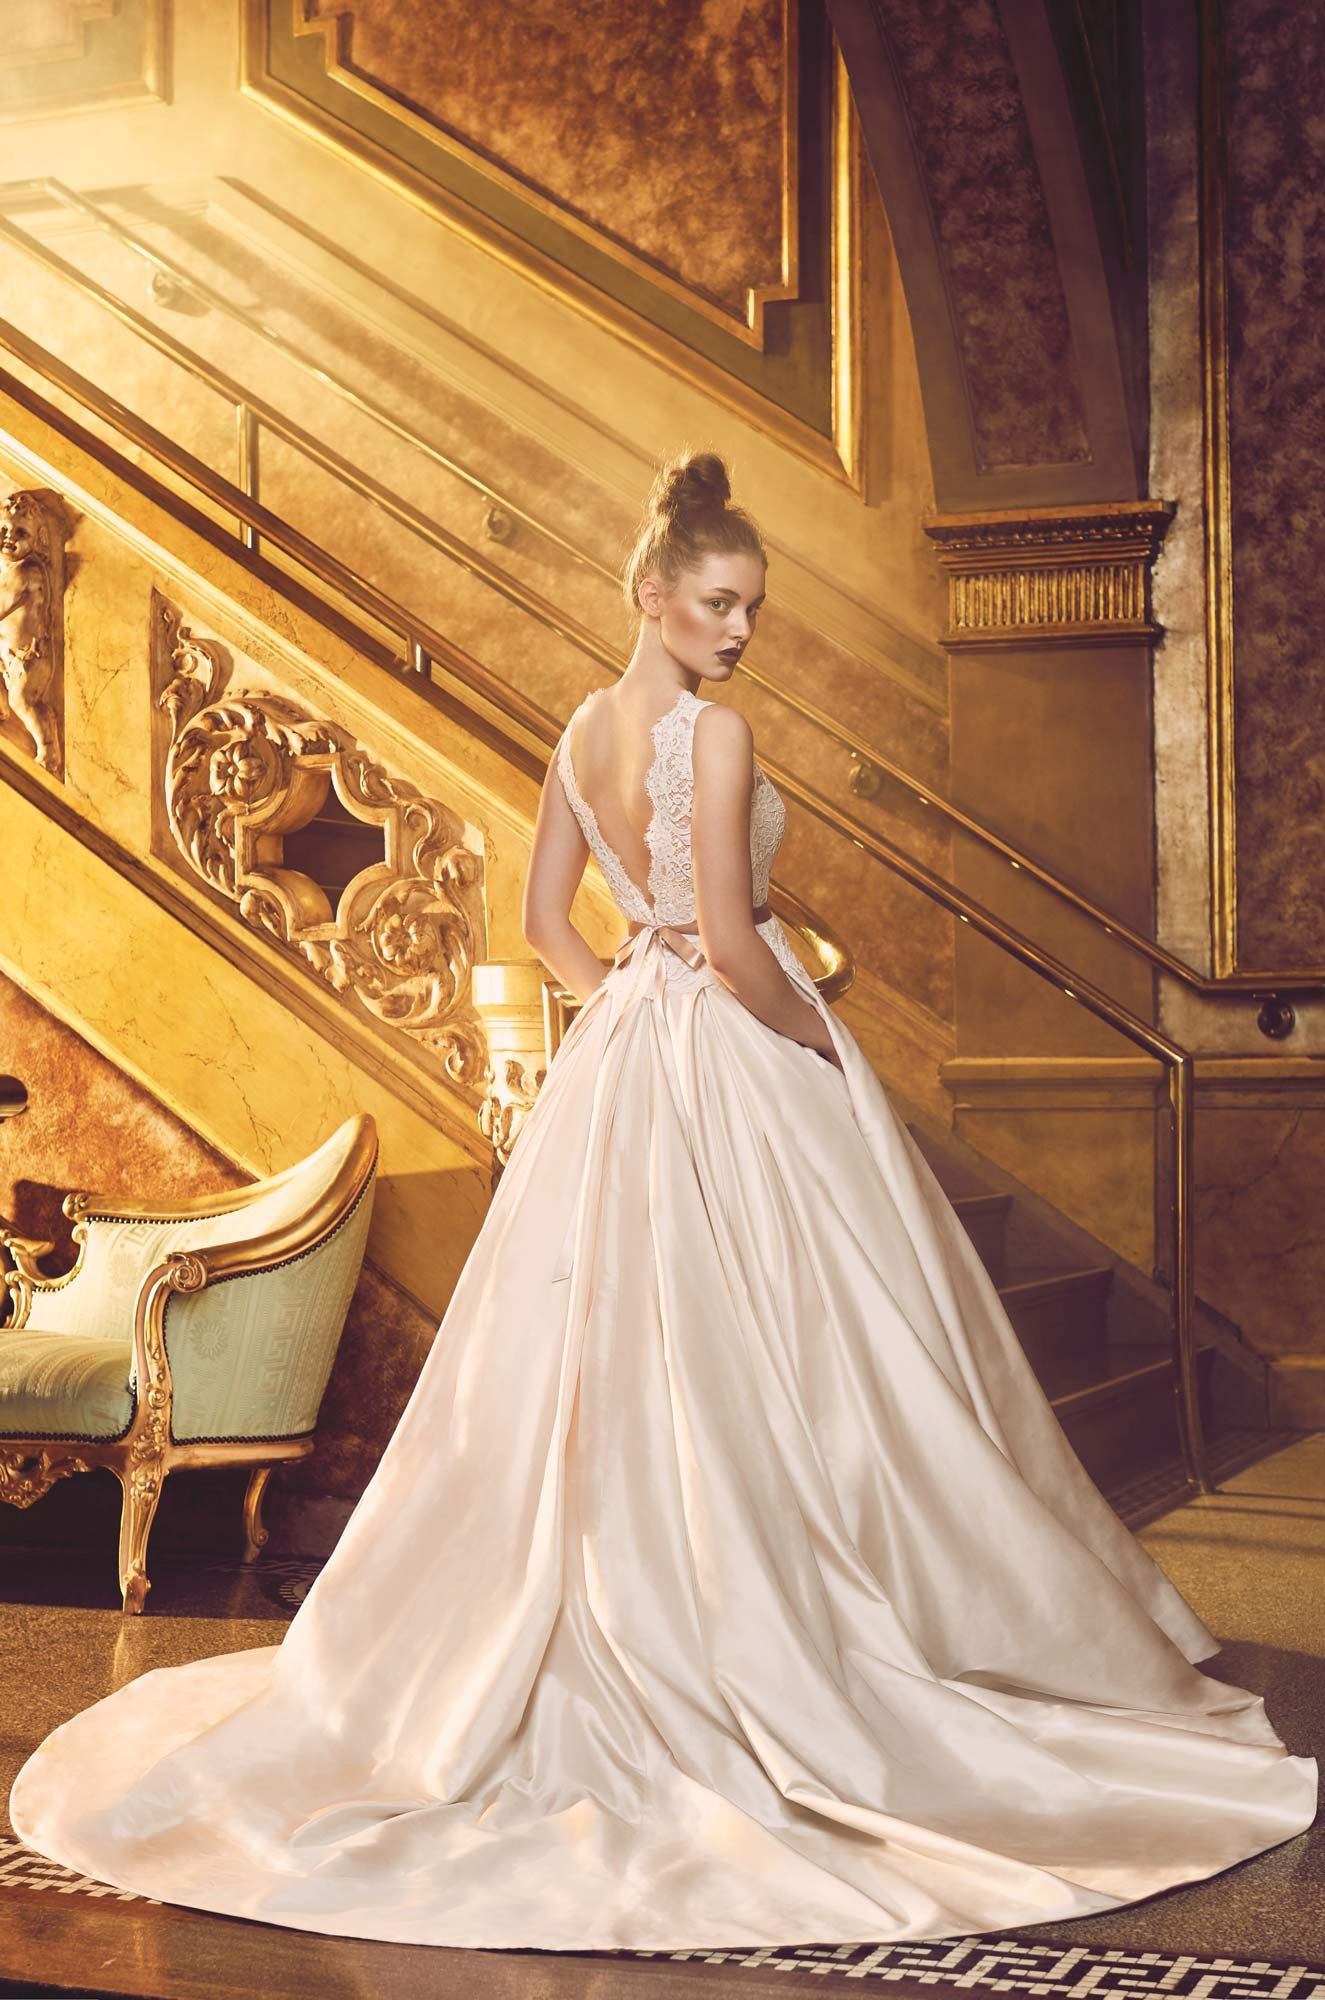 Silk ball gown wedding dress style box pleats lace bodice